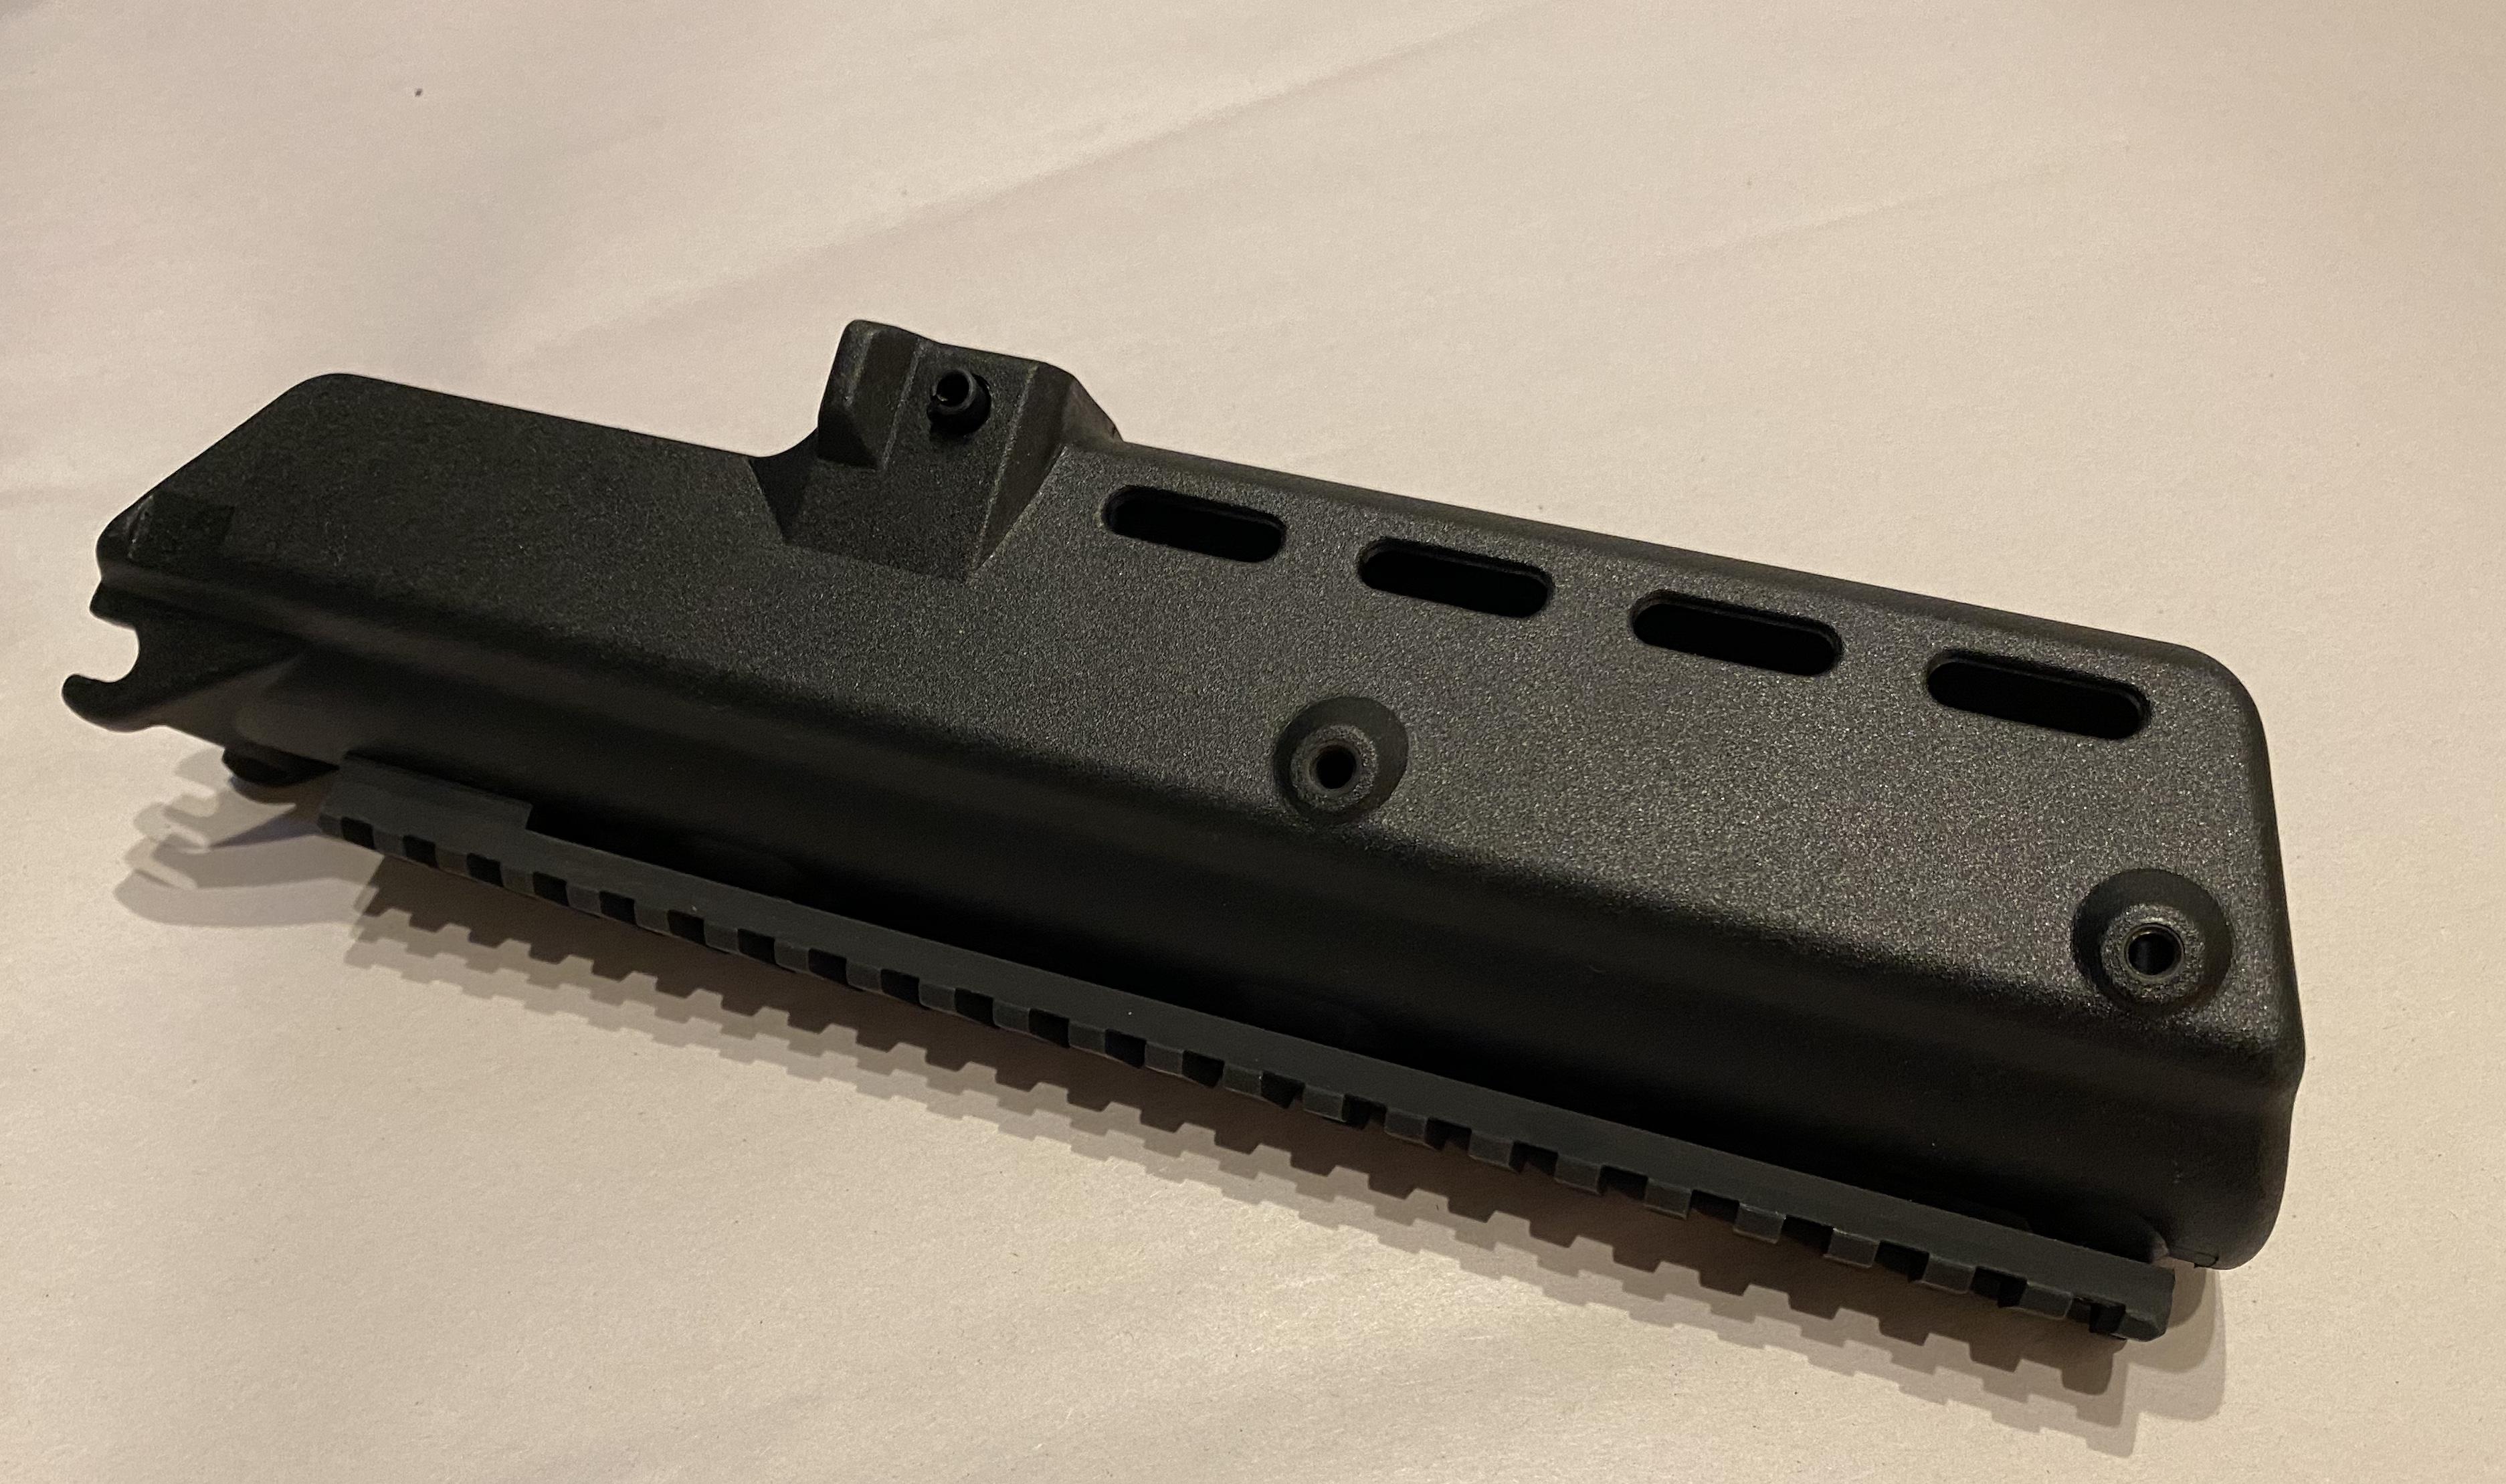 WTS: Parts list-G36E/K handguards, sight rails, G28 FH, MR556/416 stock/grip, VP9/P30-b133ea47-0e10-4f08-8228-24f7f112dad6.jpeg